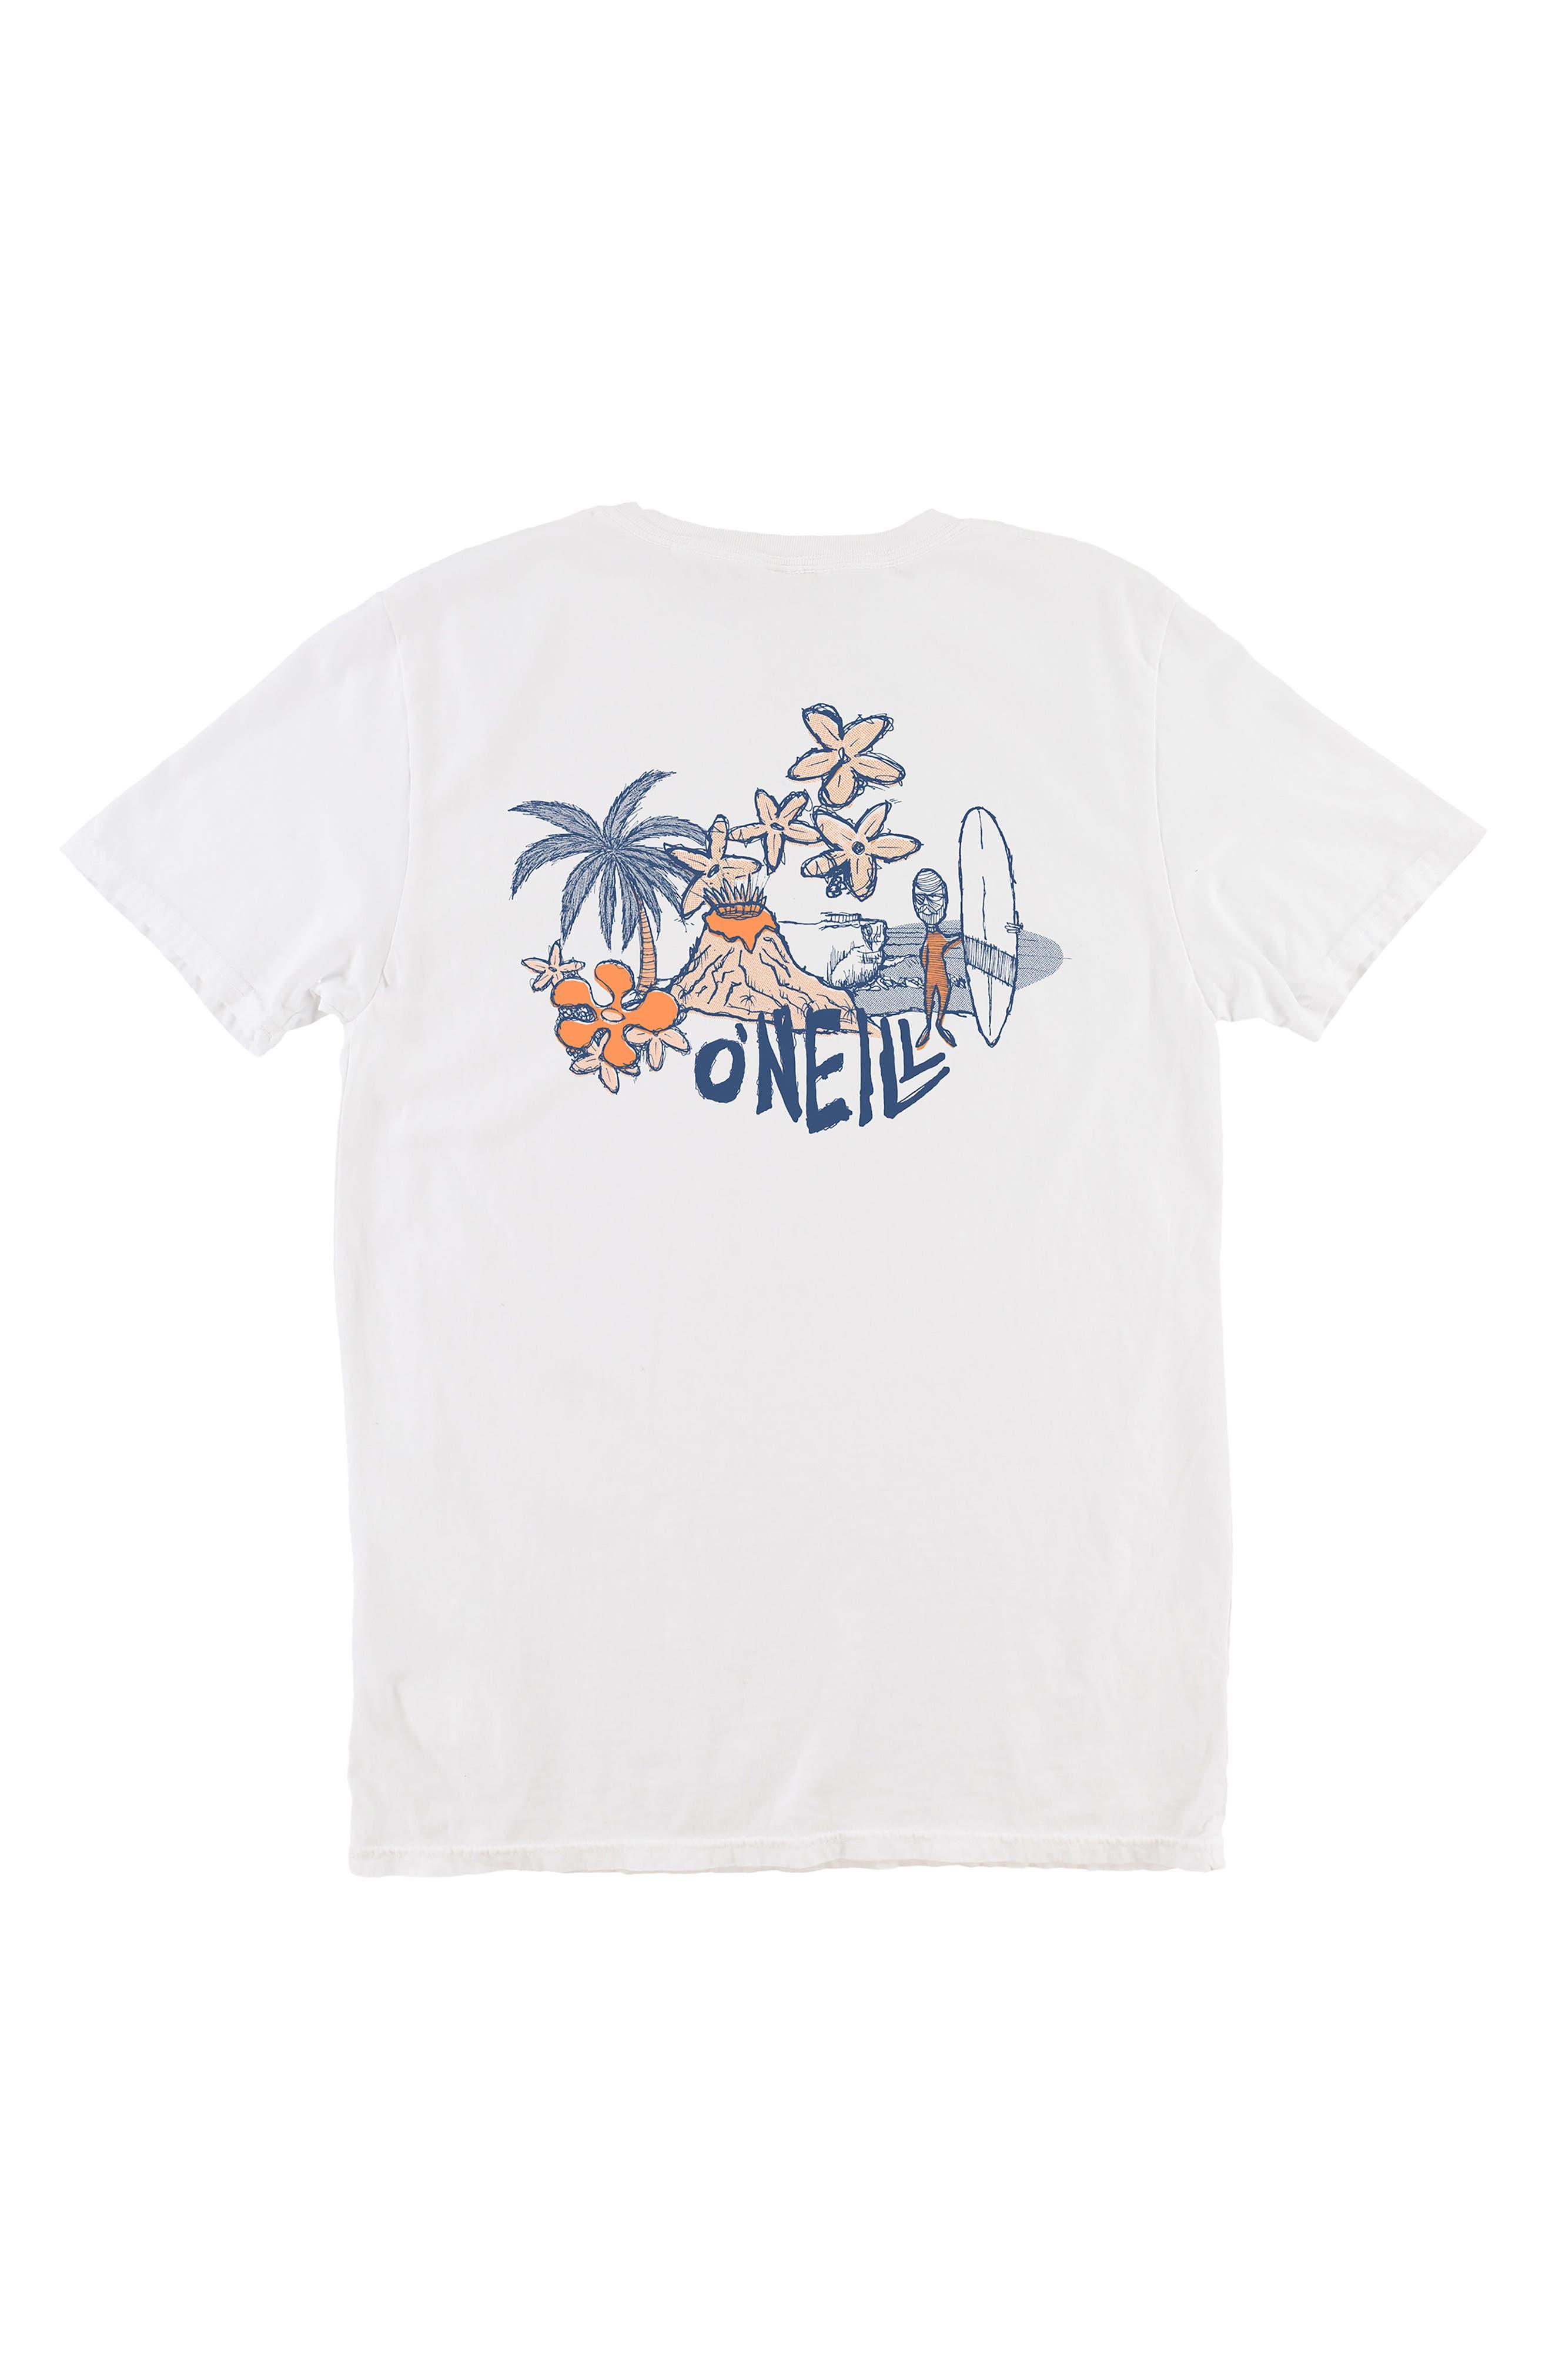 Simich T-Shirt,                             Alternate thumbnail 2, color,                             100